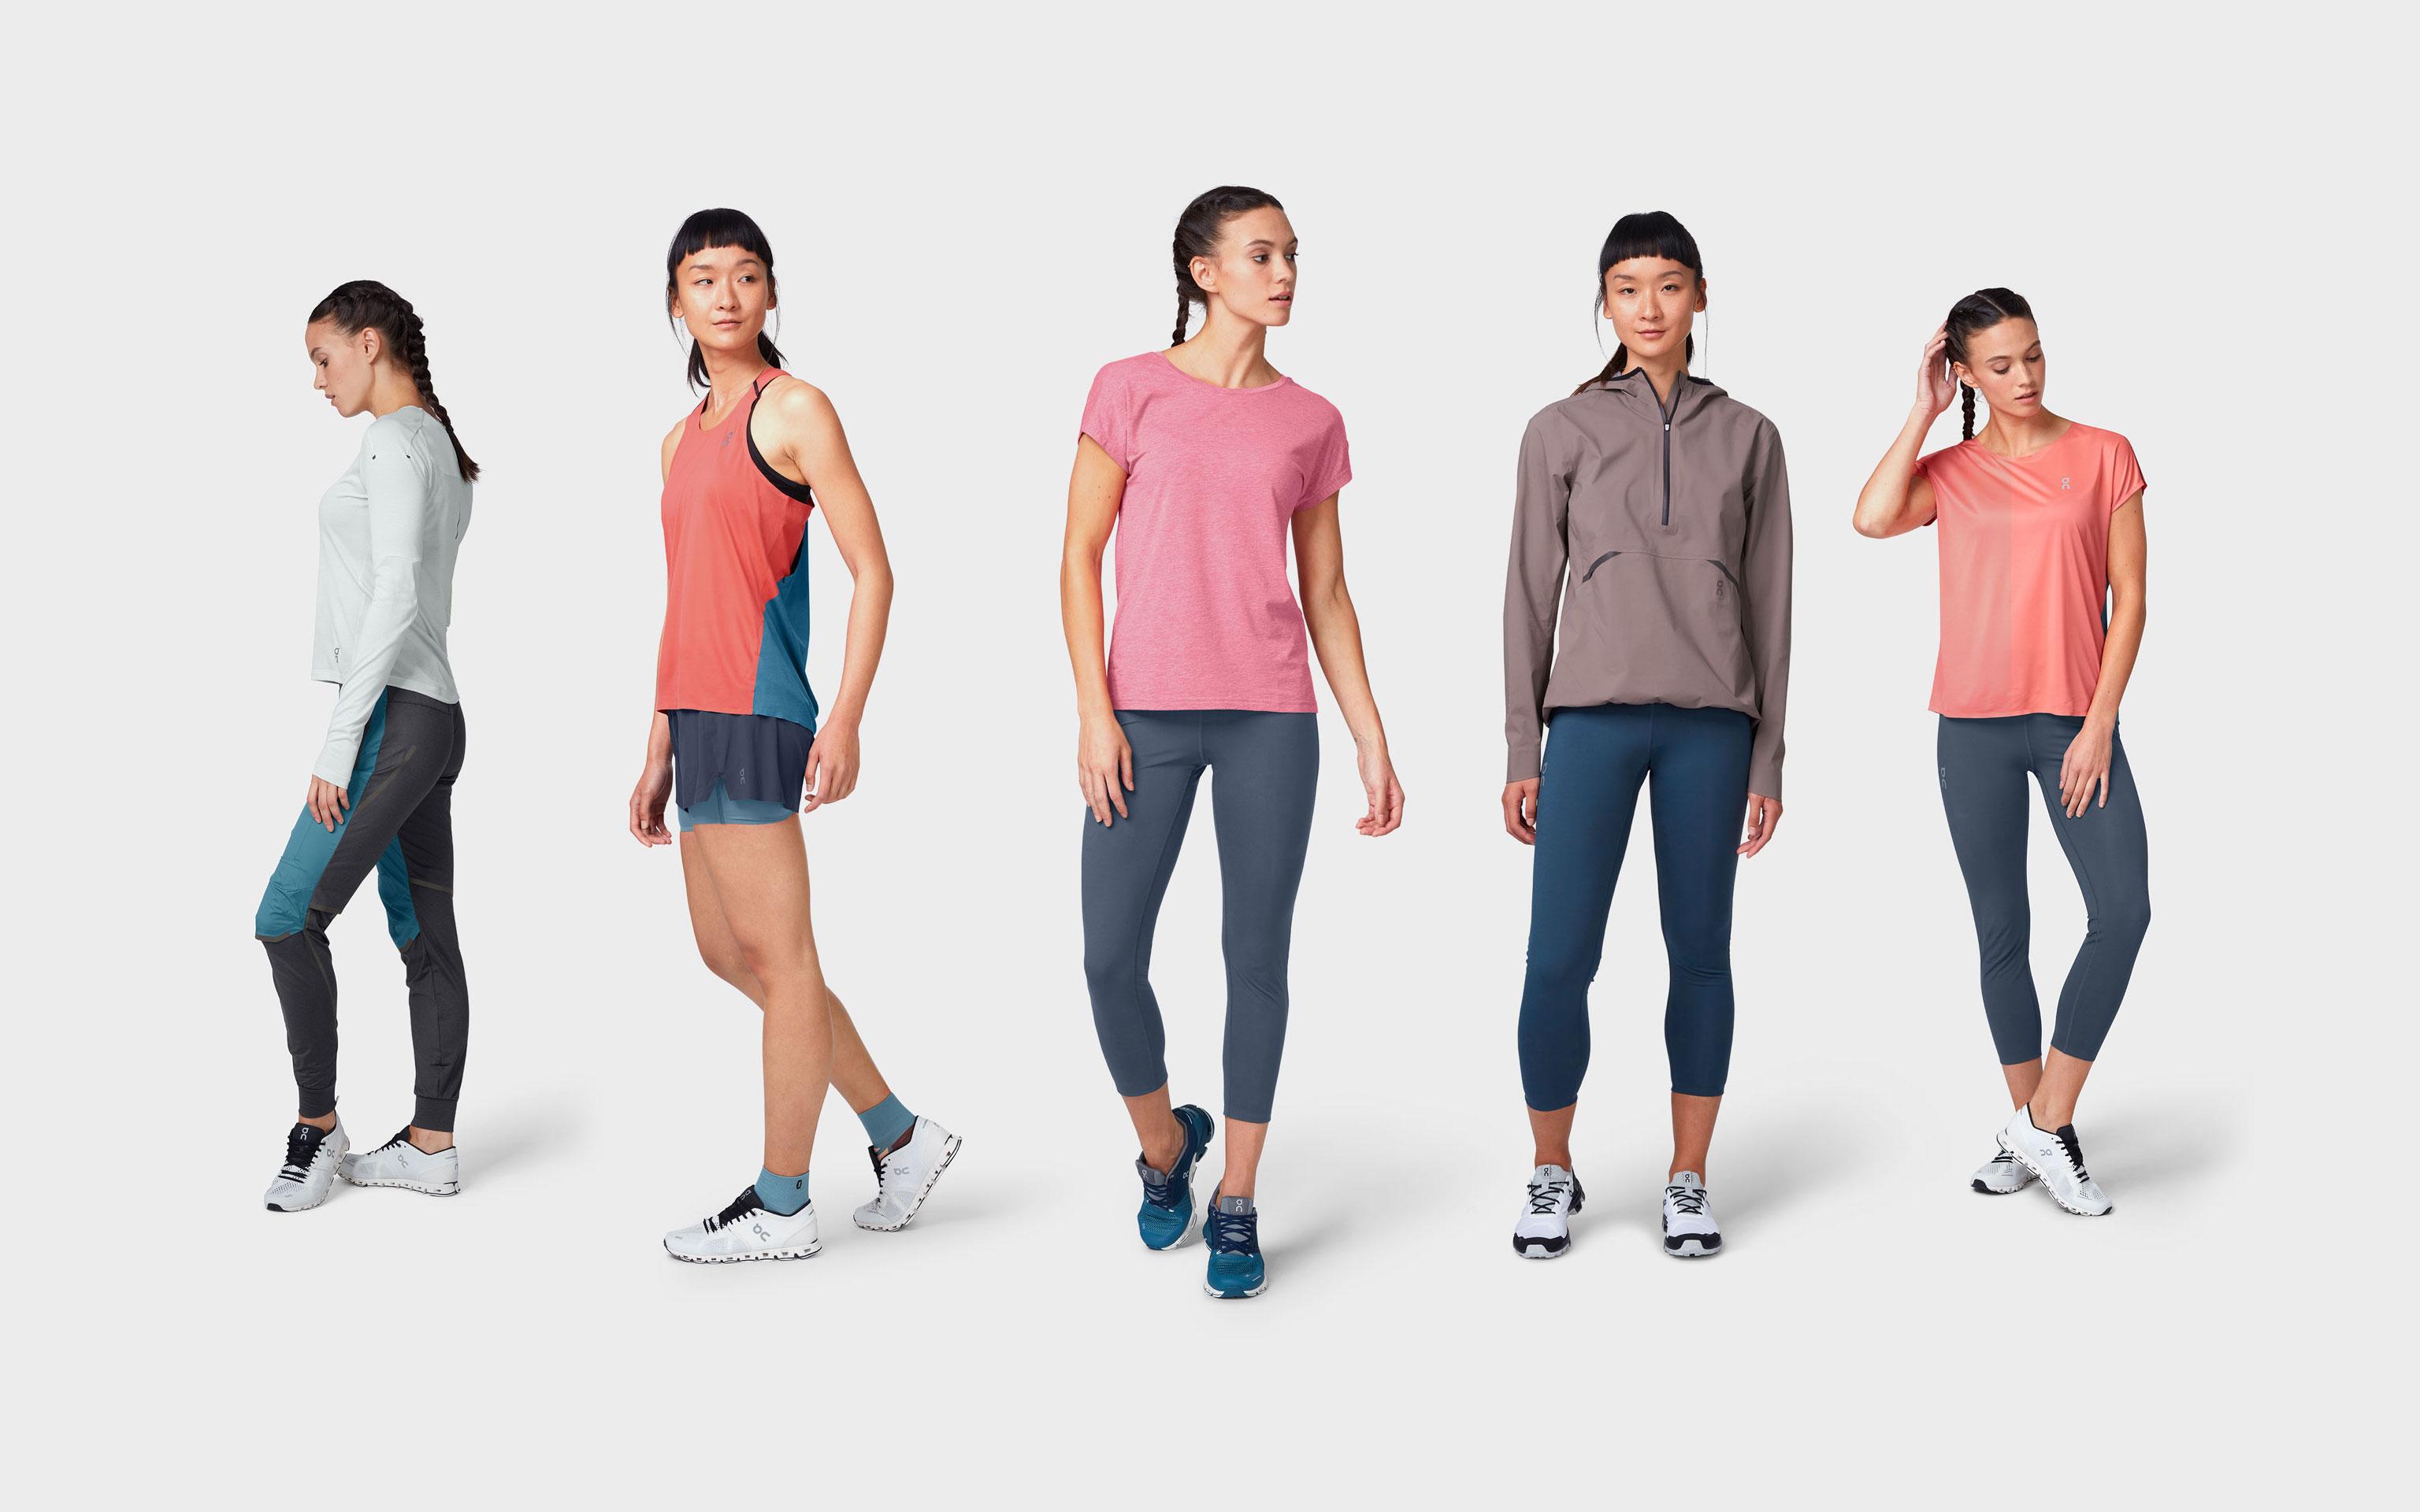 Womenswear Sports brand